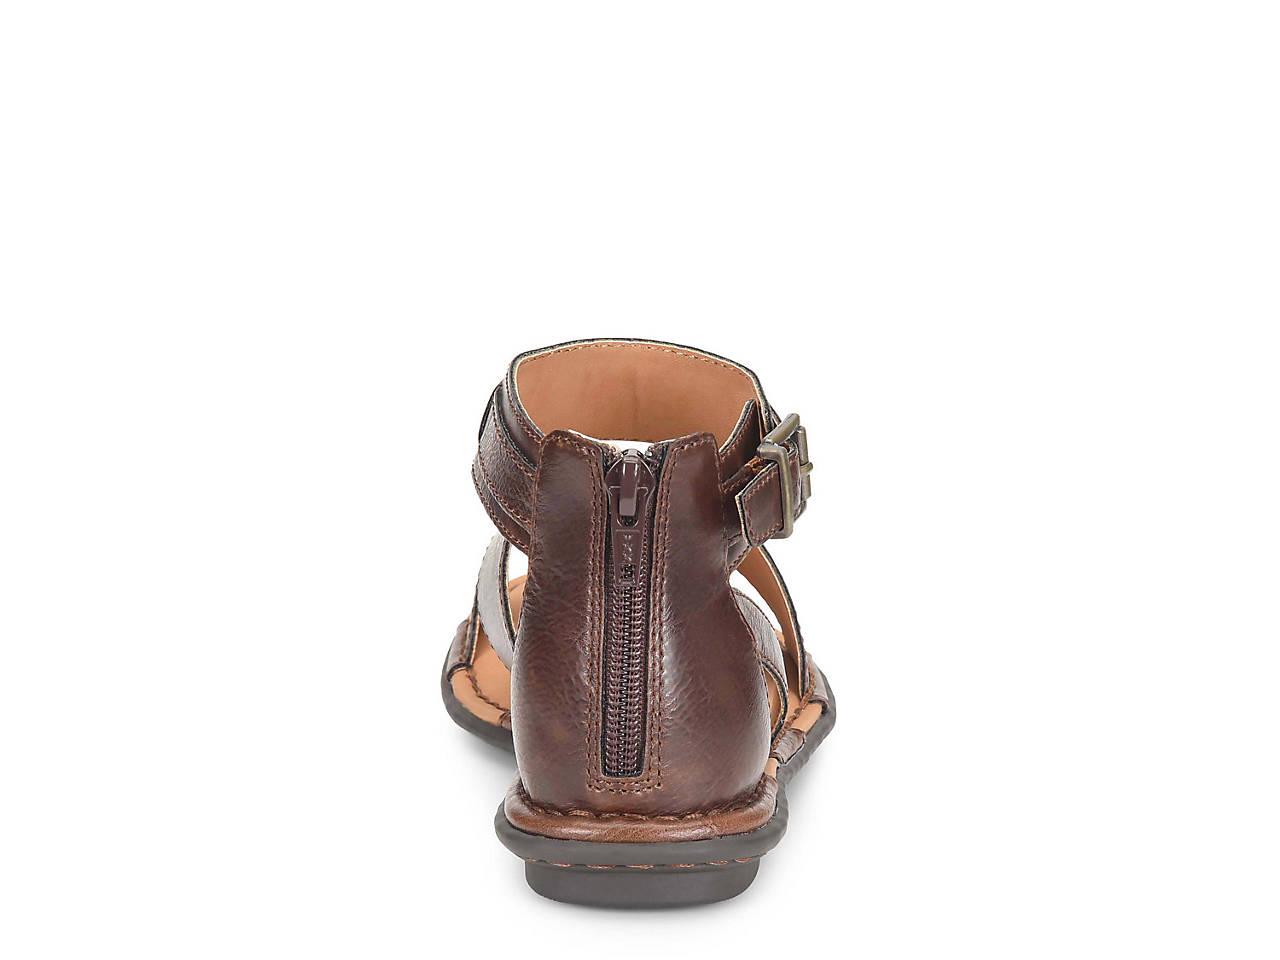 c891ccd82fff b.o.c Leila Sandal Women s Shoes